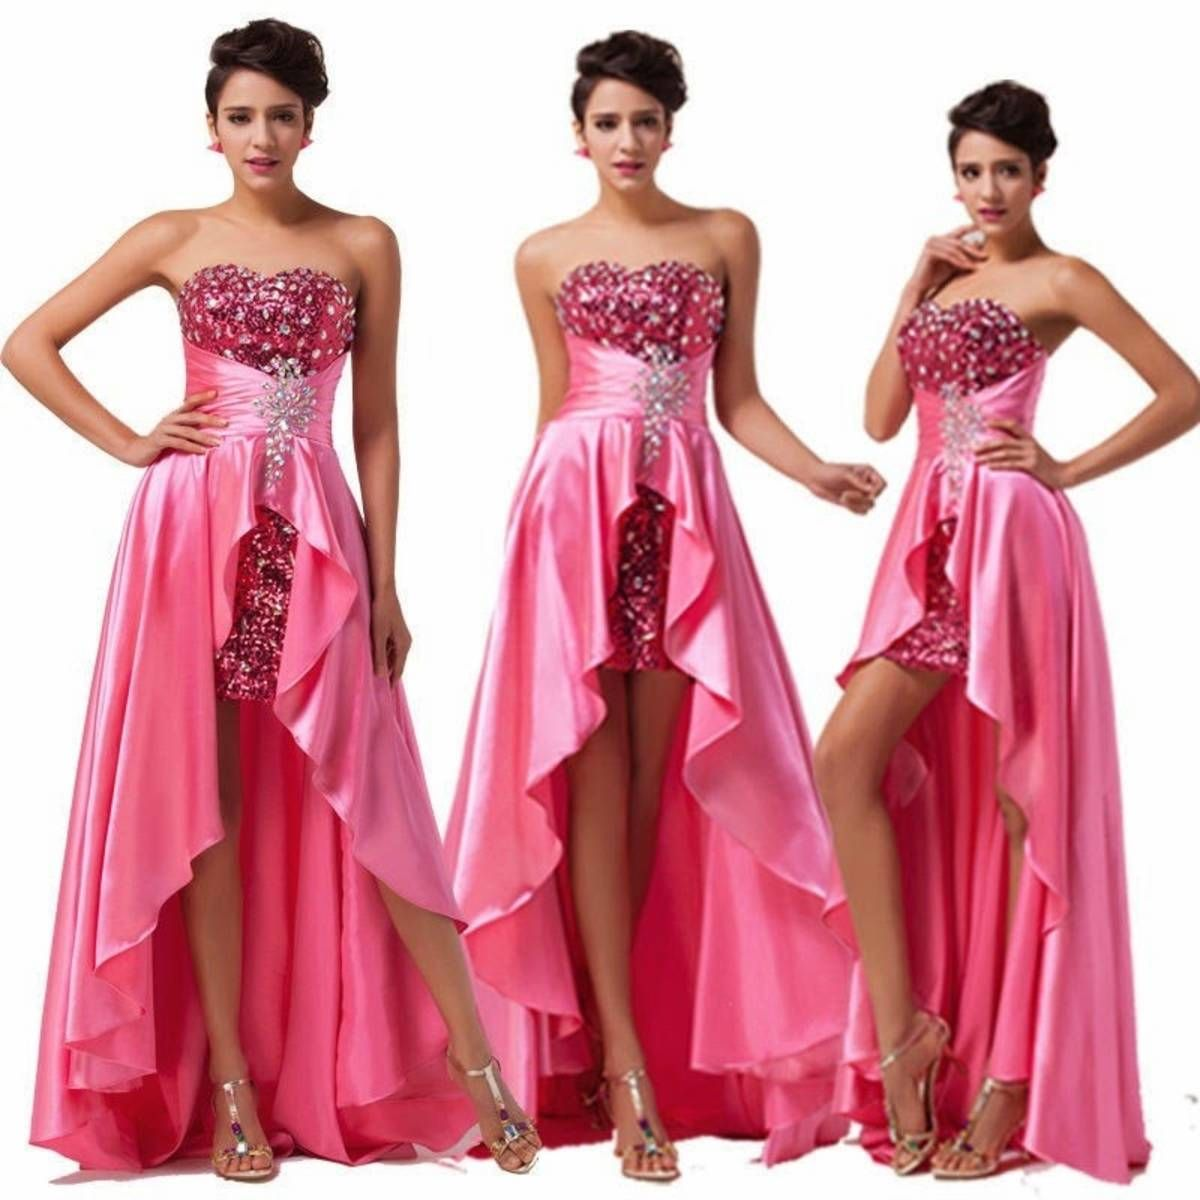 mjt217uyked3uam3dt3t.jpg (1200×1200) | vestidos e cabelosss pro ...